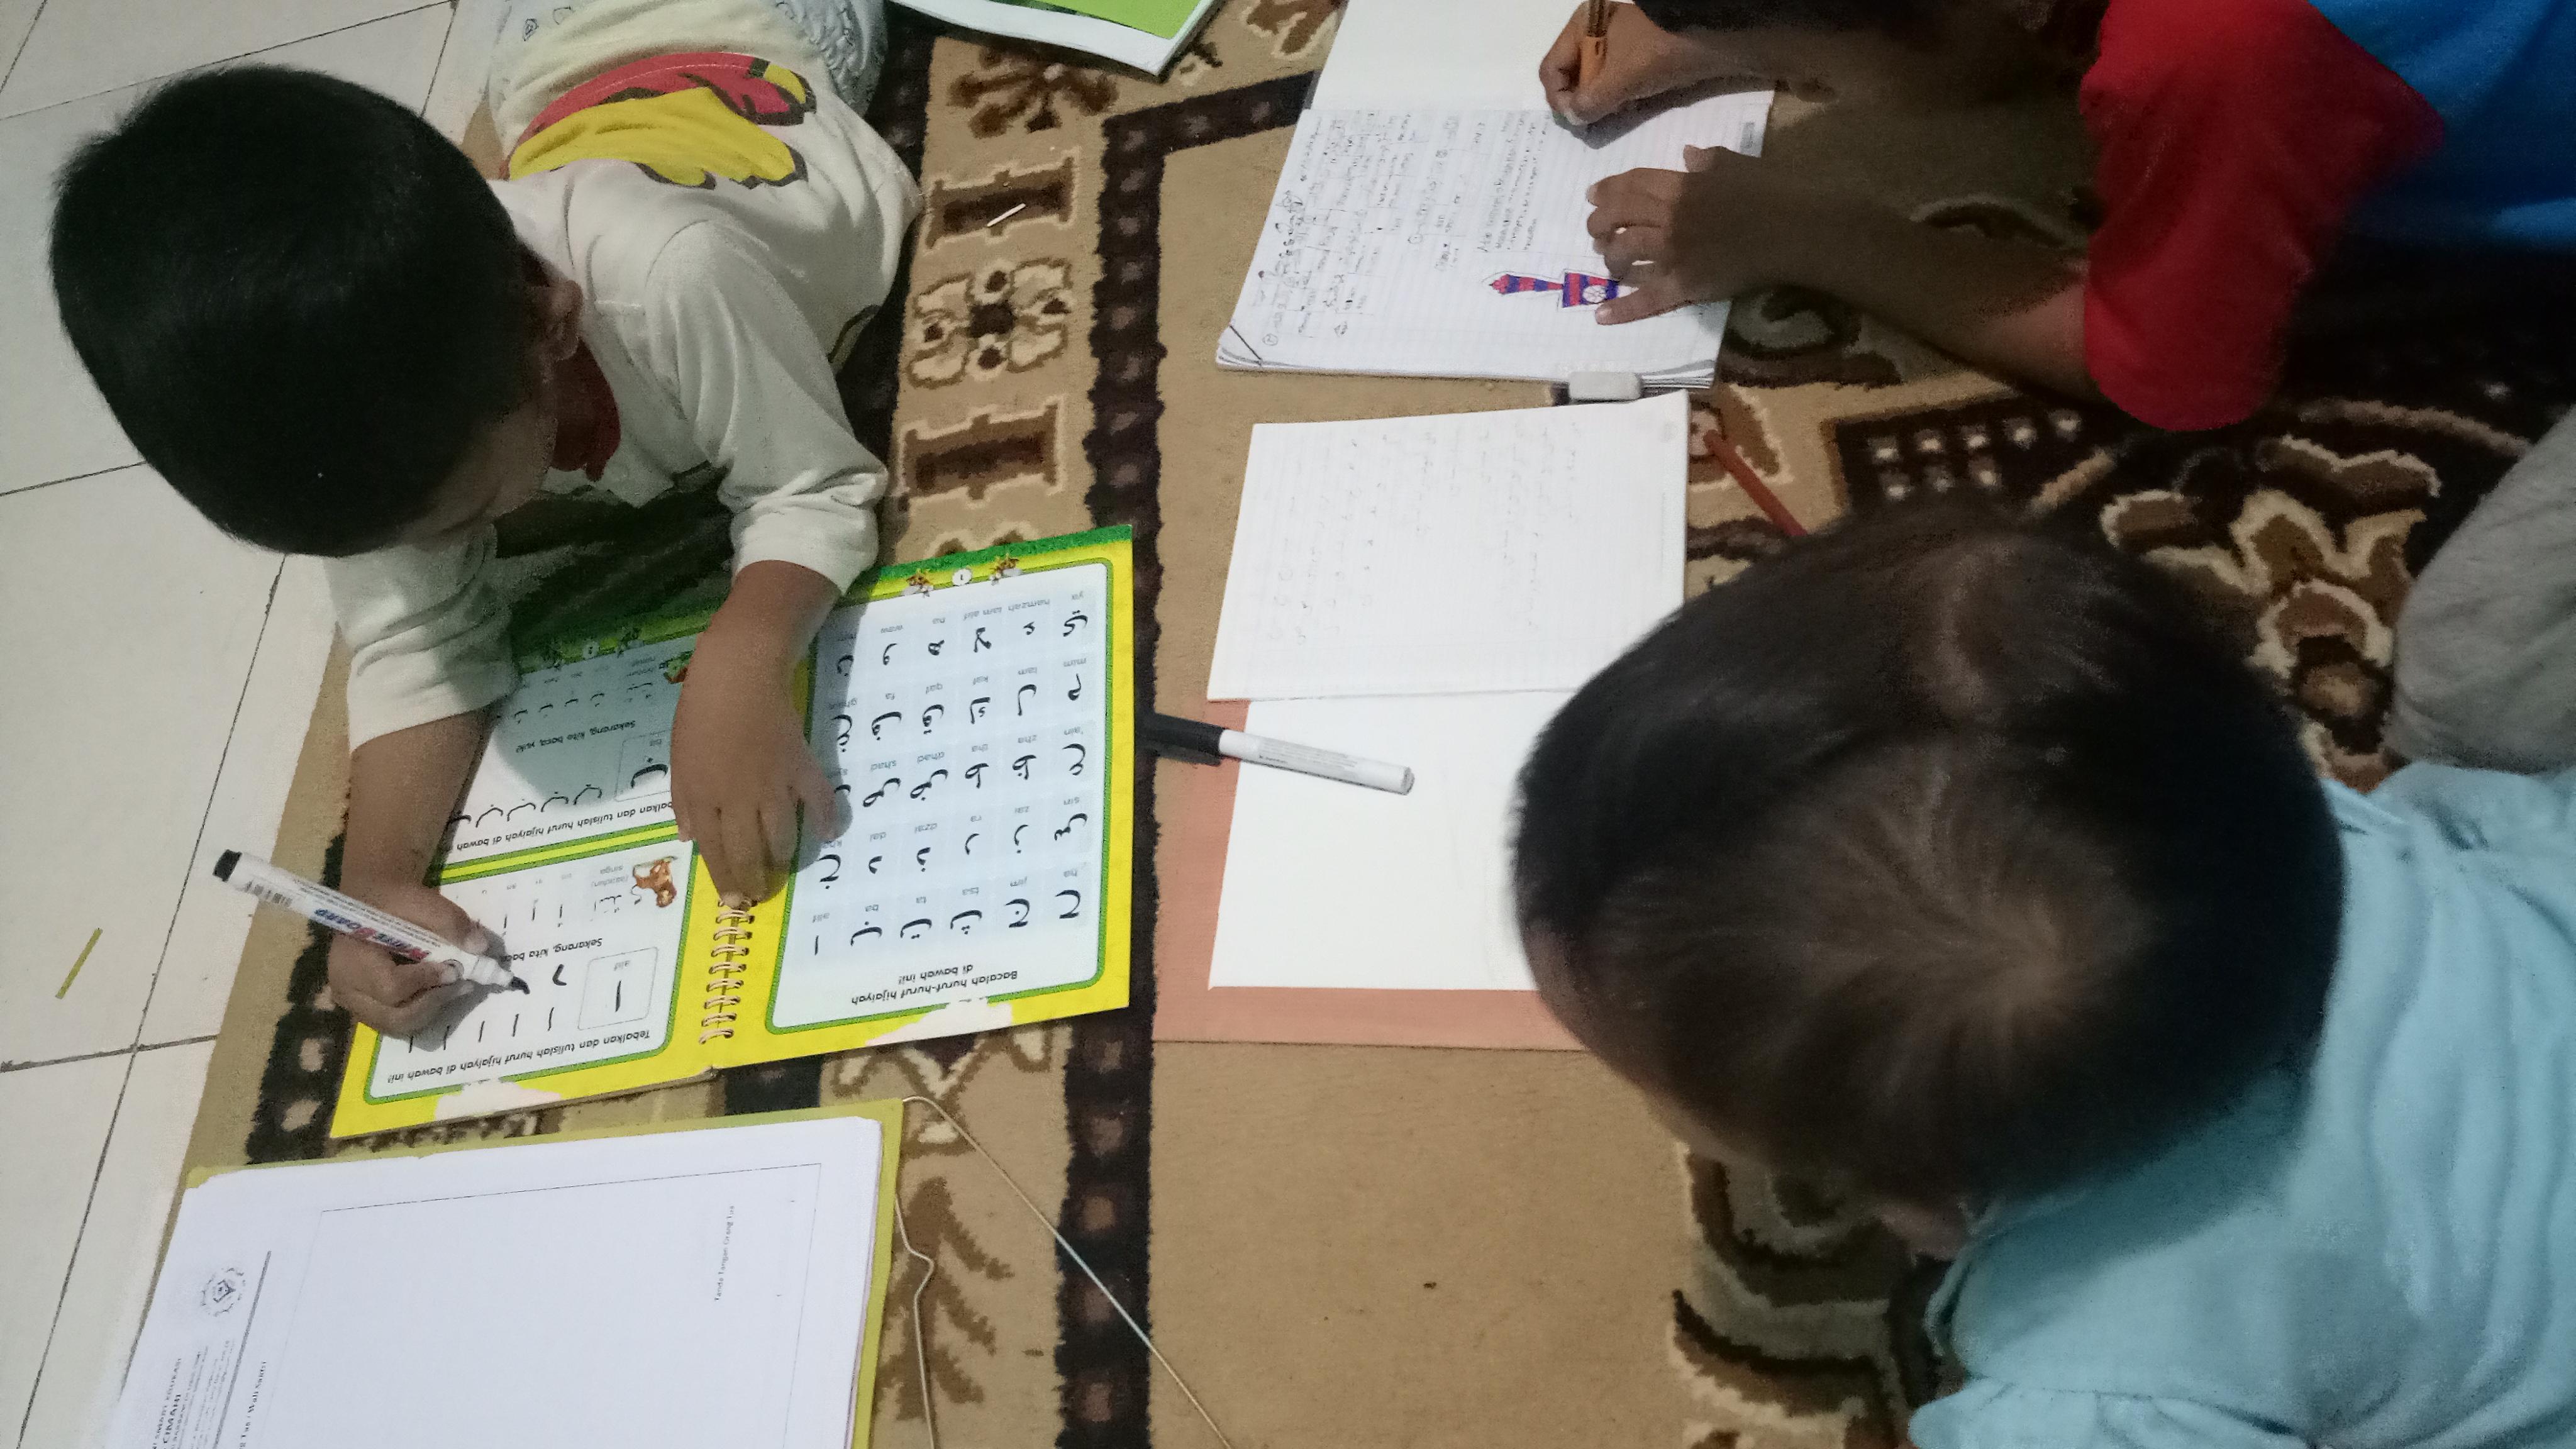 Ada 2 cara Azam belajar menulis mengikuti titik titik yang membentuk huruf dan menirukan Keduanya dilakukan Dan kali ini menggunakan bantuan buku hapus